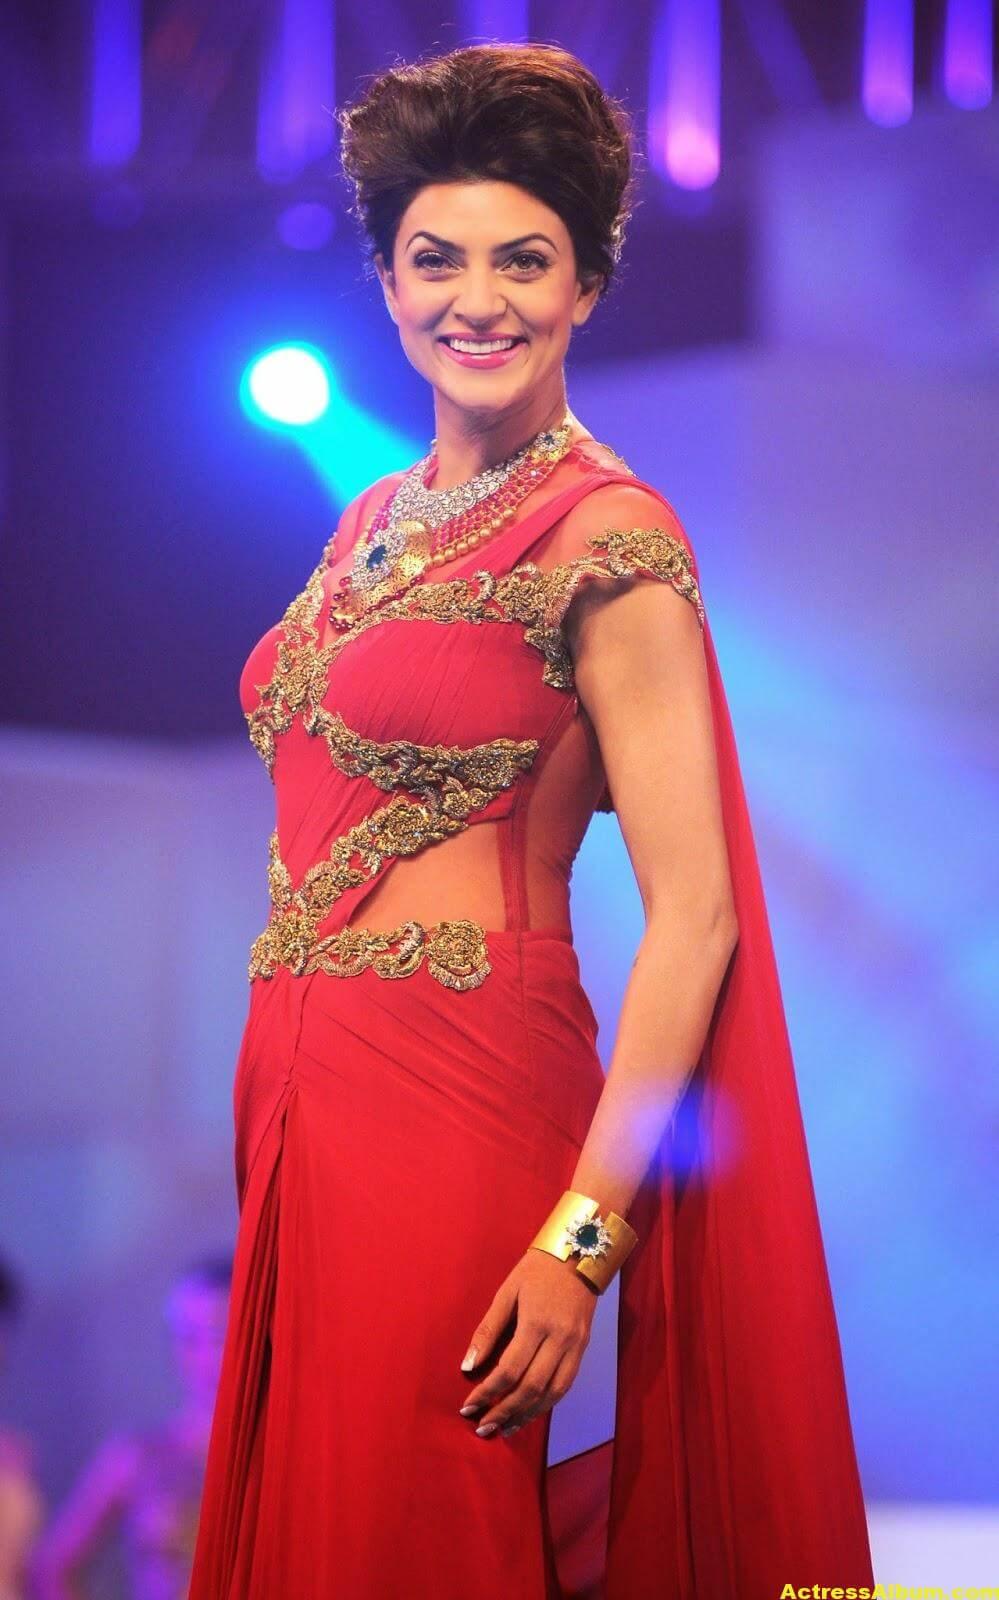 Sushmita Sen Hot Photos In Red Saree - Actress Album